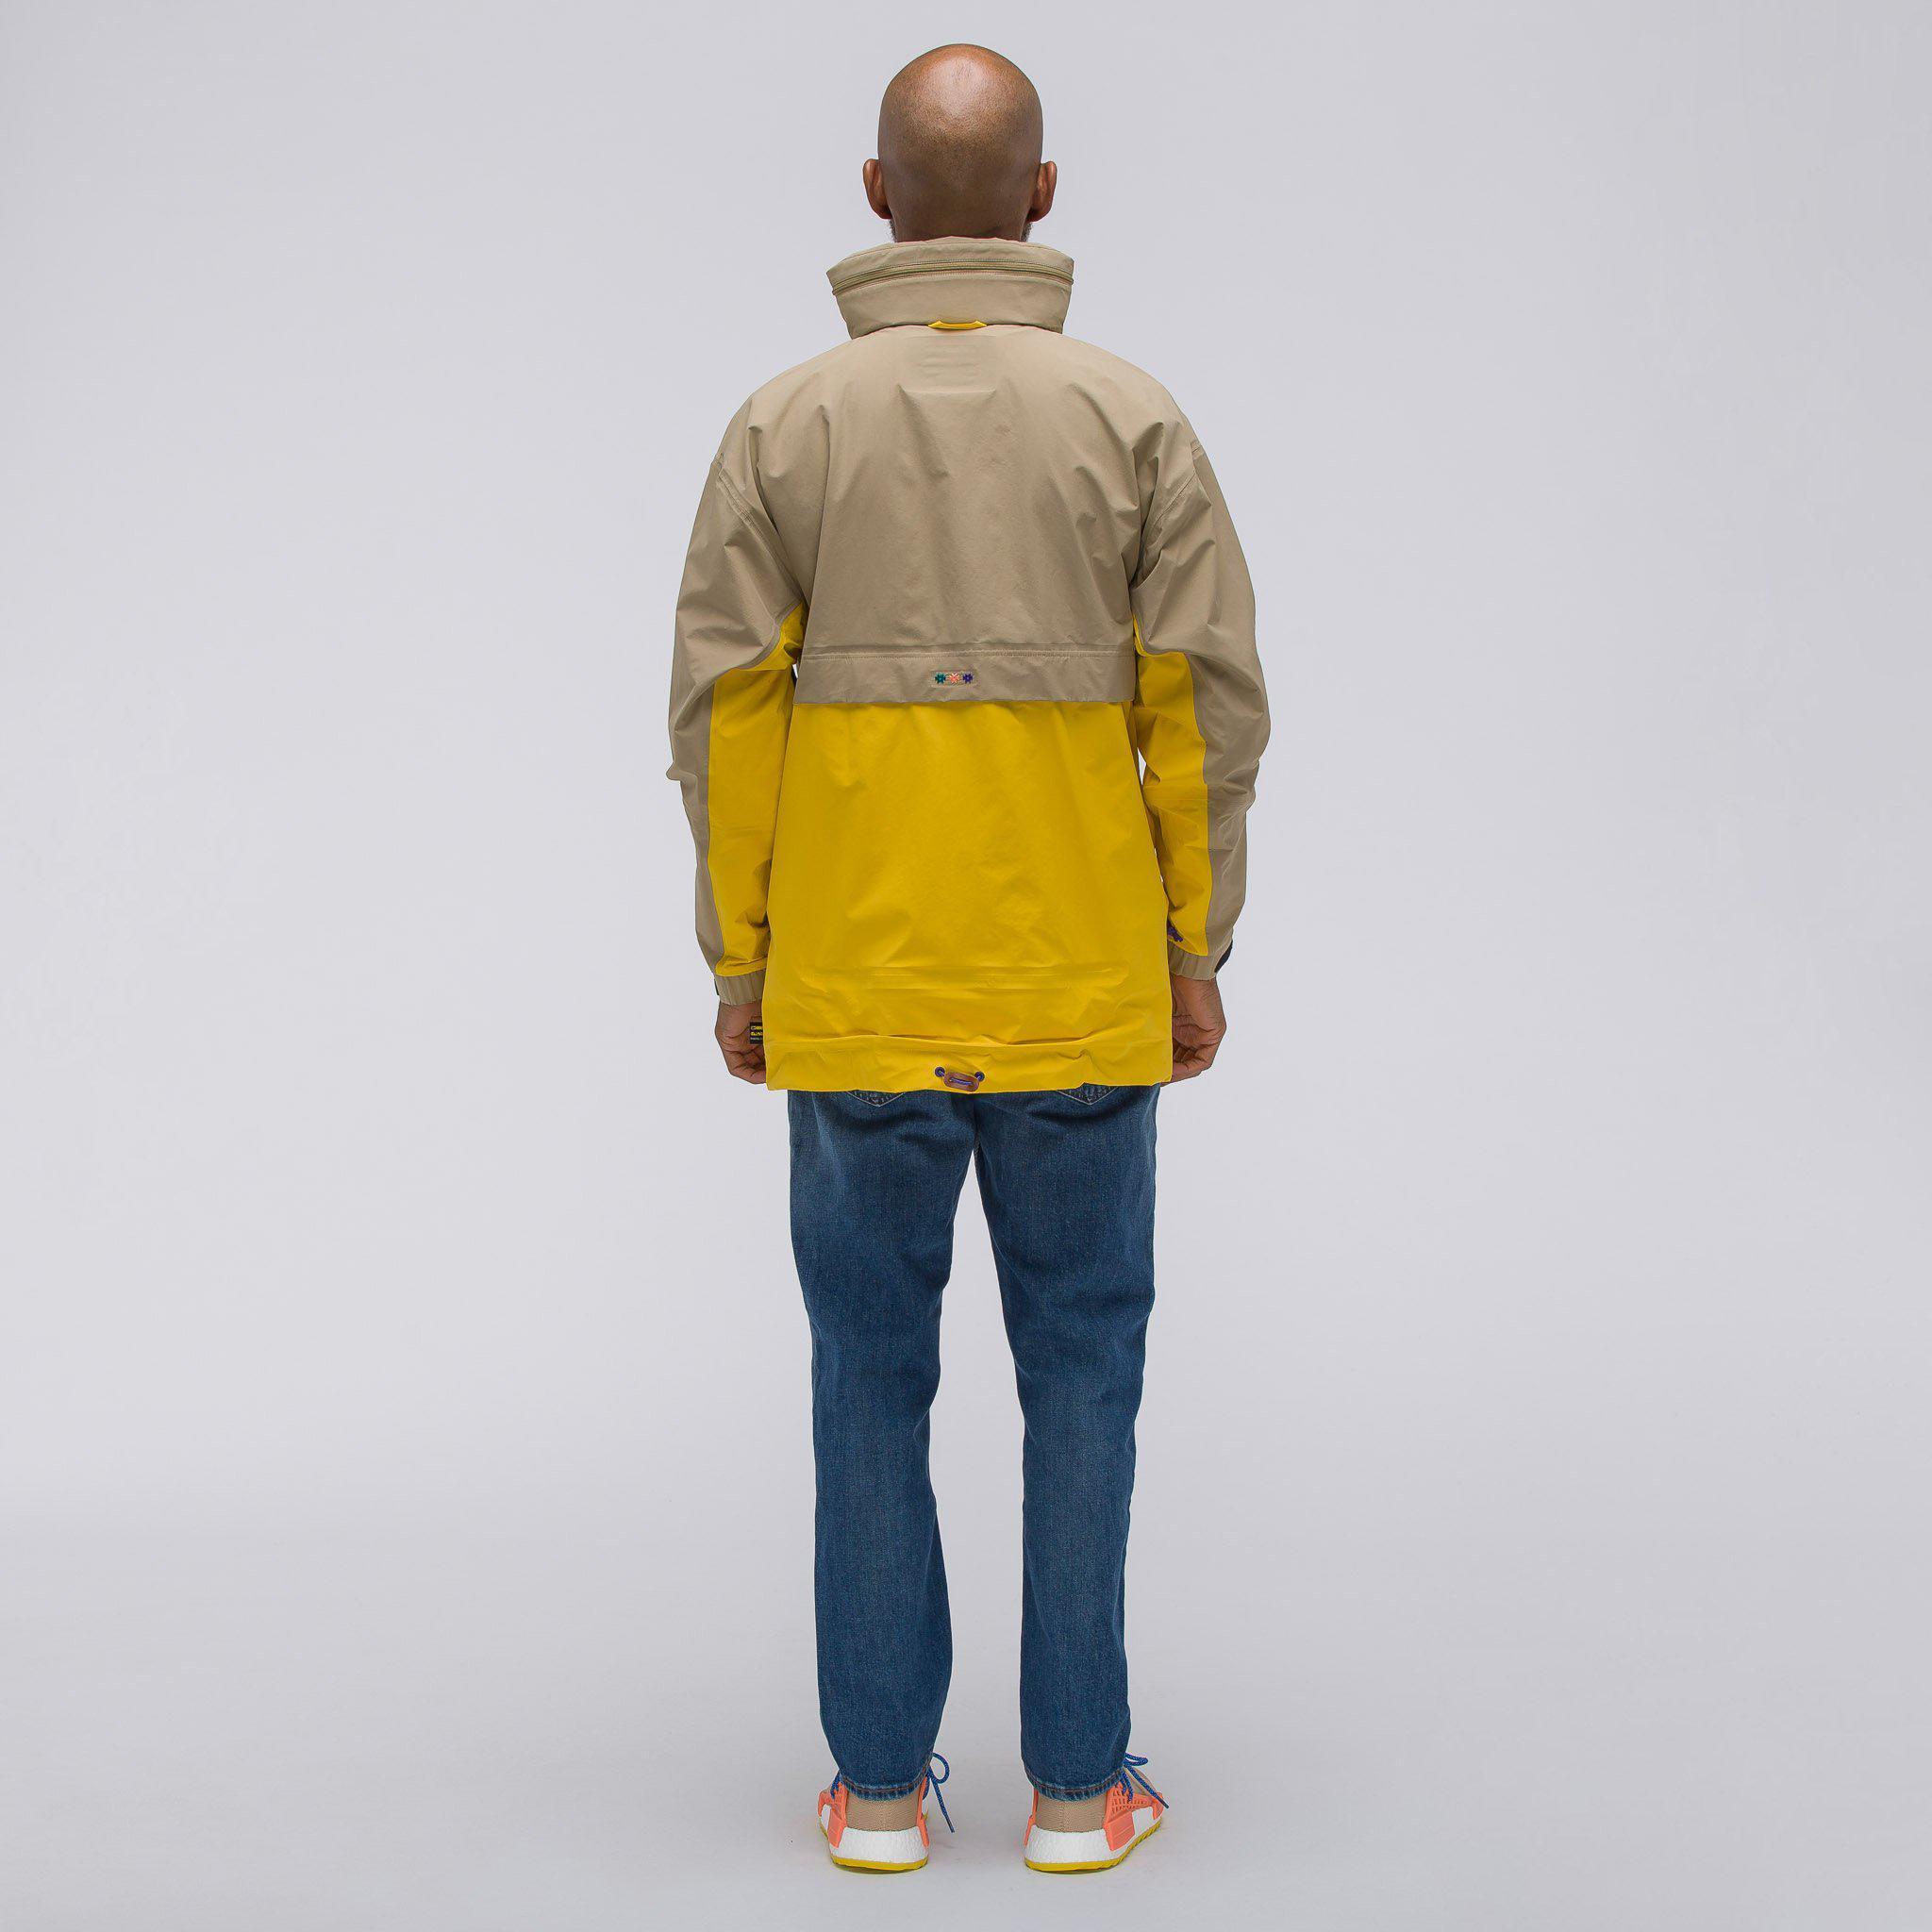 da1291c58e33 Lyst - adidas Pharrell Williams Hu Hiking 3-layer Jacket for Men